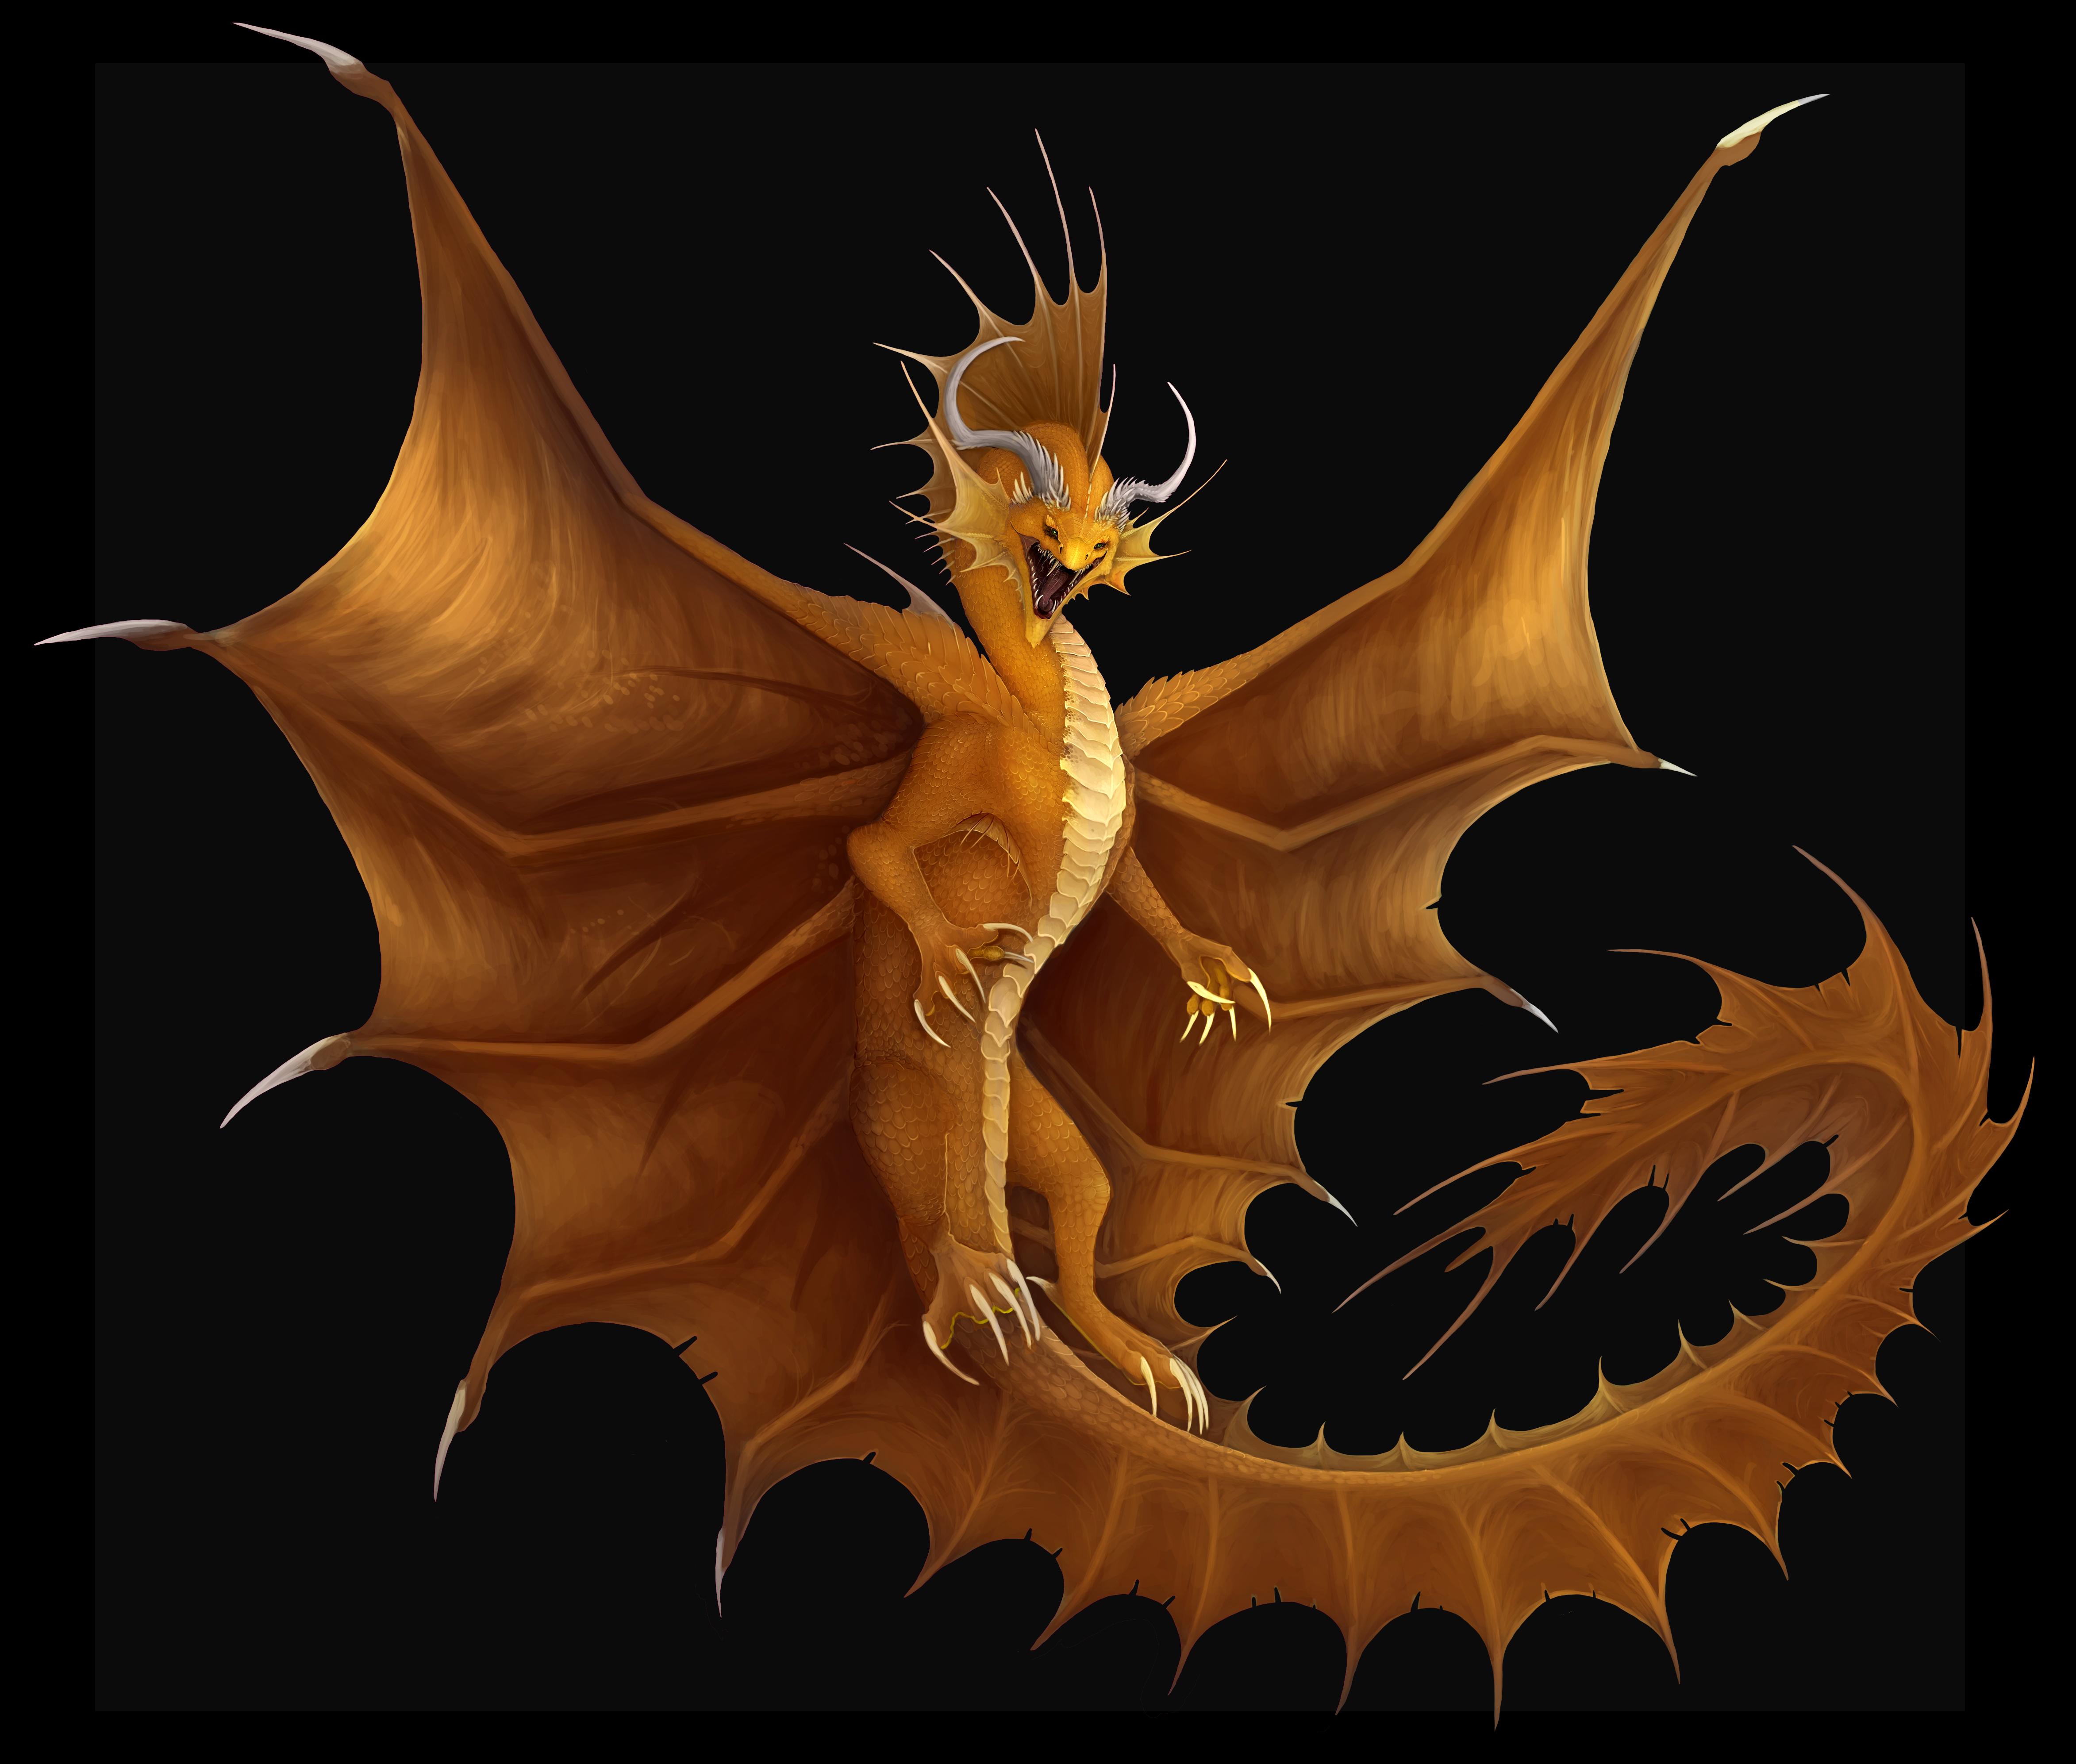 Golden dragon deviantart can taking steroids raise your blood sugar